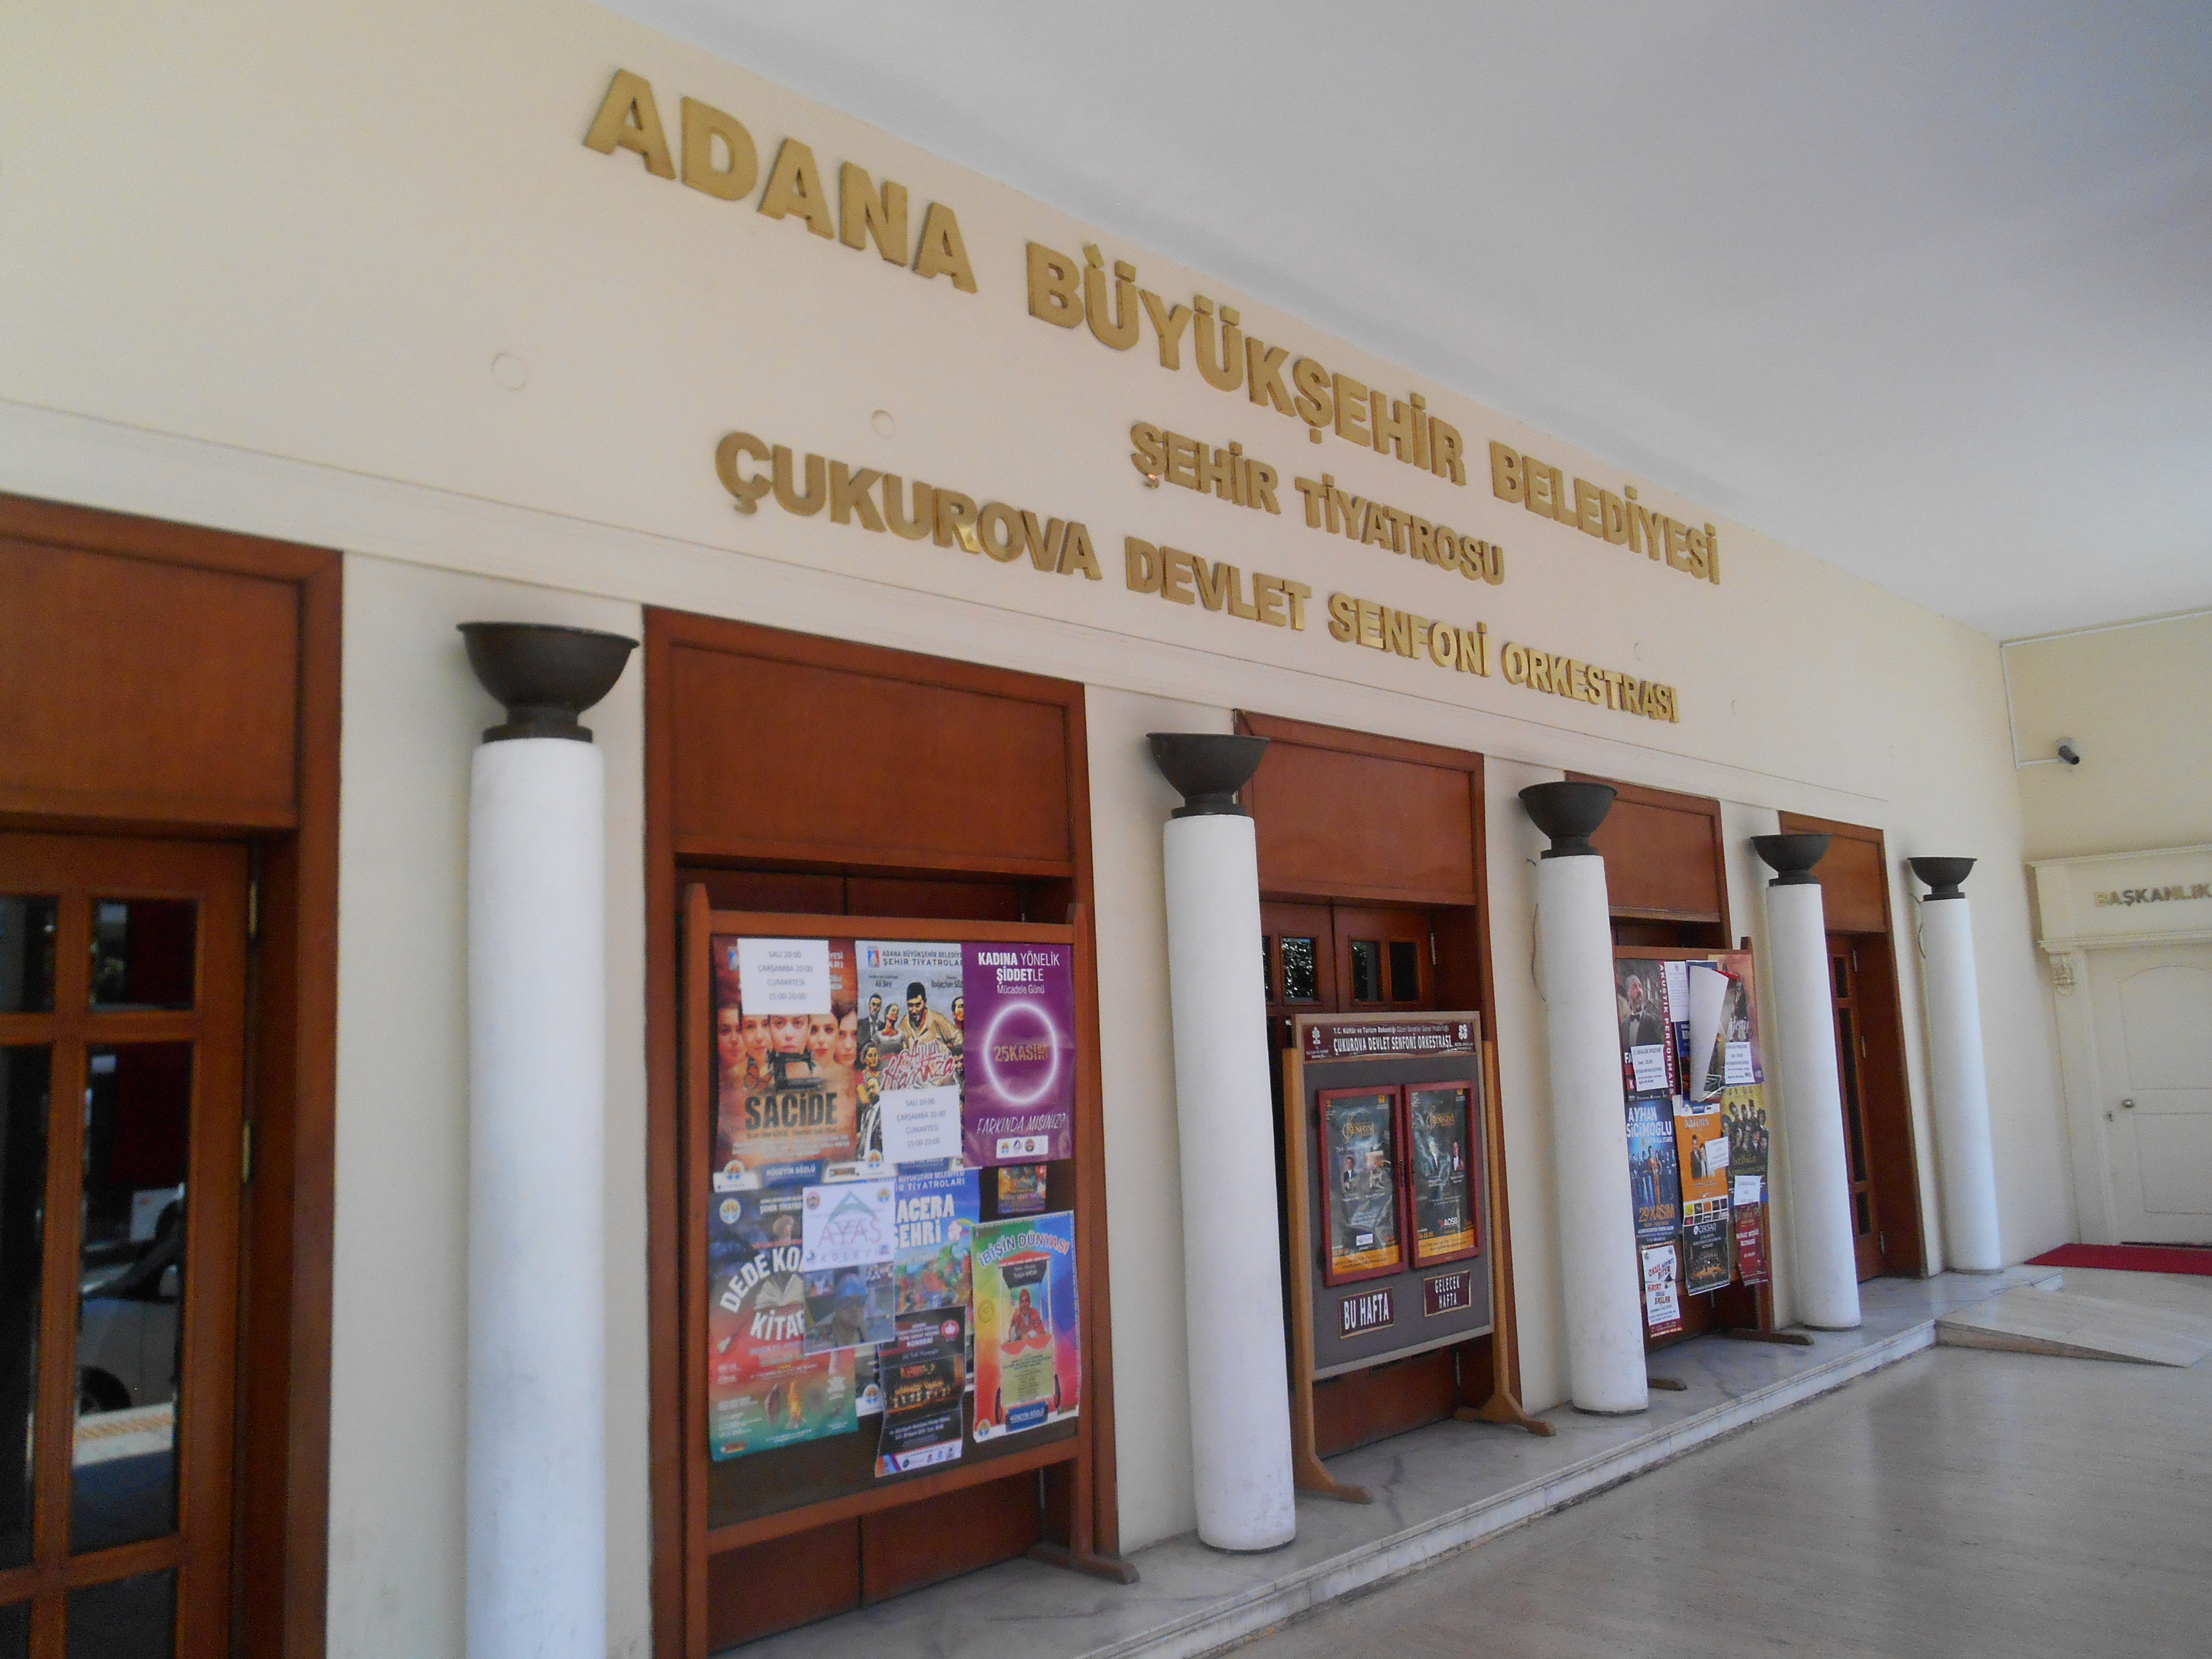 FileAdana Metropolitan Hall - Doors.JPG & File:Adana Metropolitan Hall - Doors.JPG - Wikimedia Commons